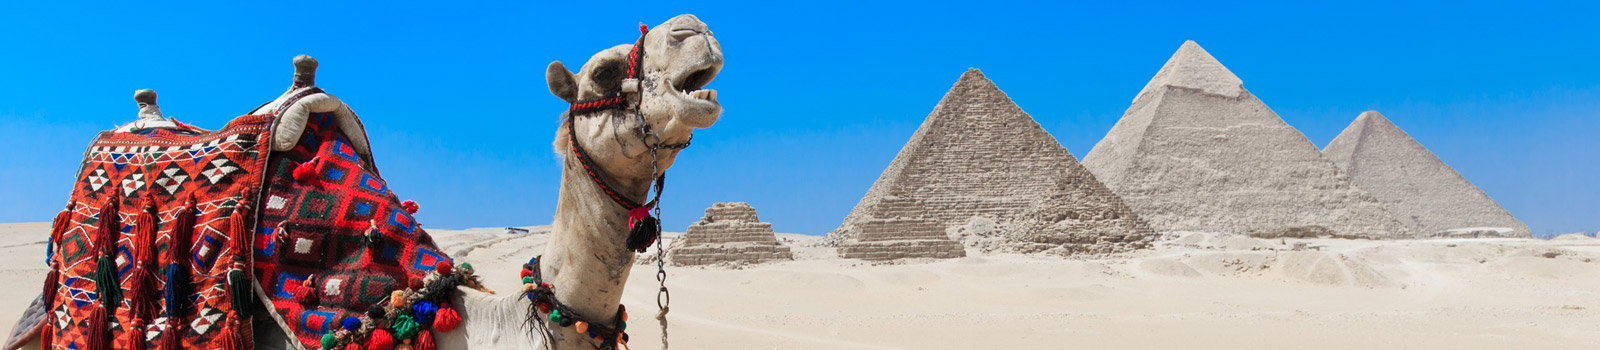 Egypt Itinerary 5 Days